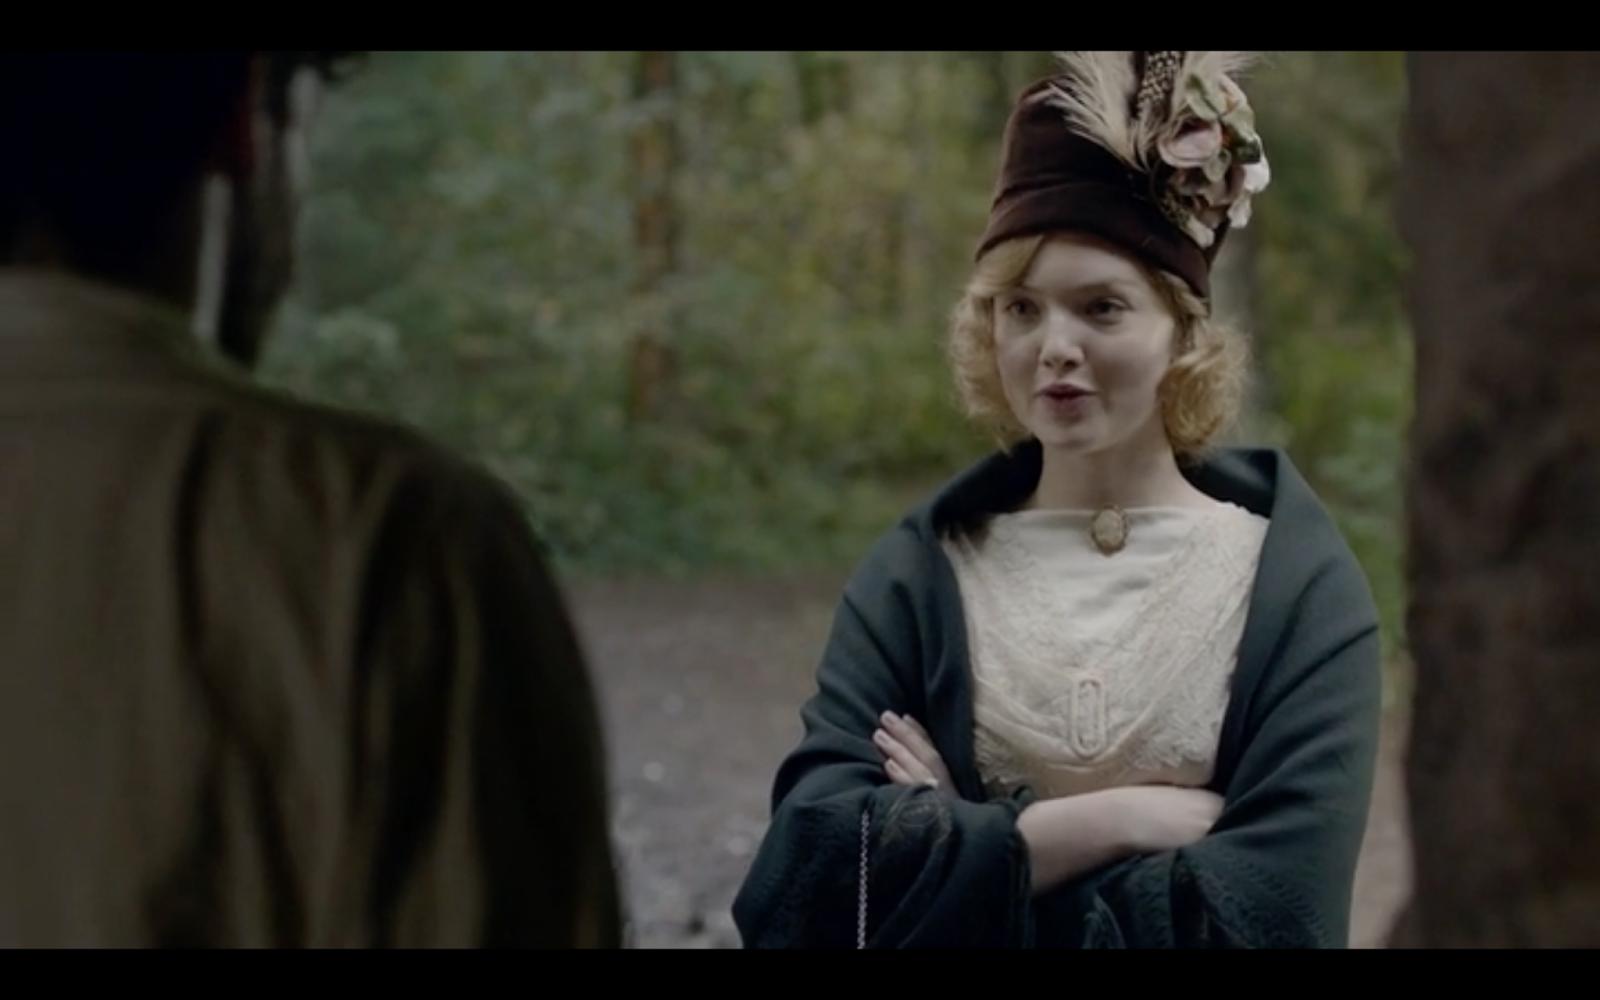 Lady chatterley filmaffinity